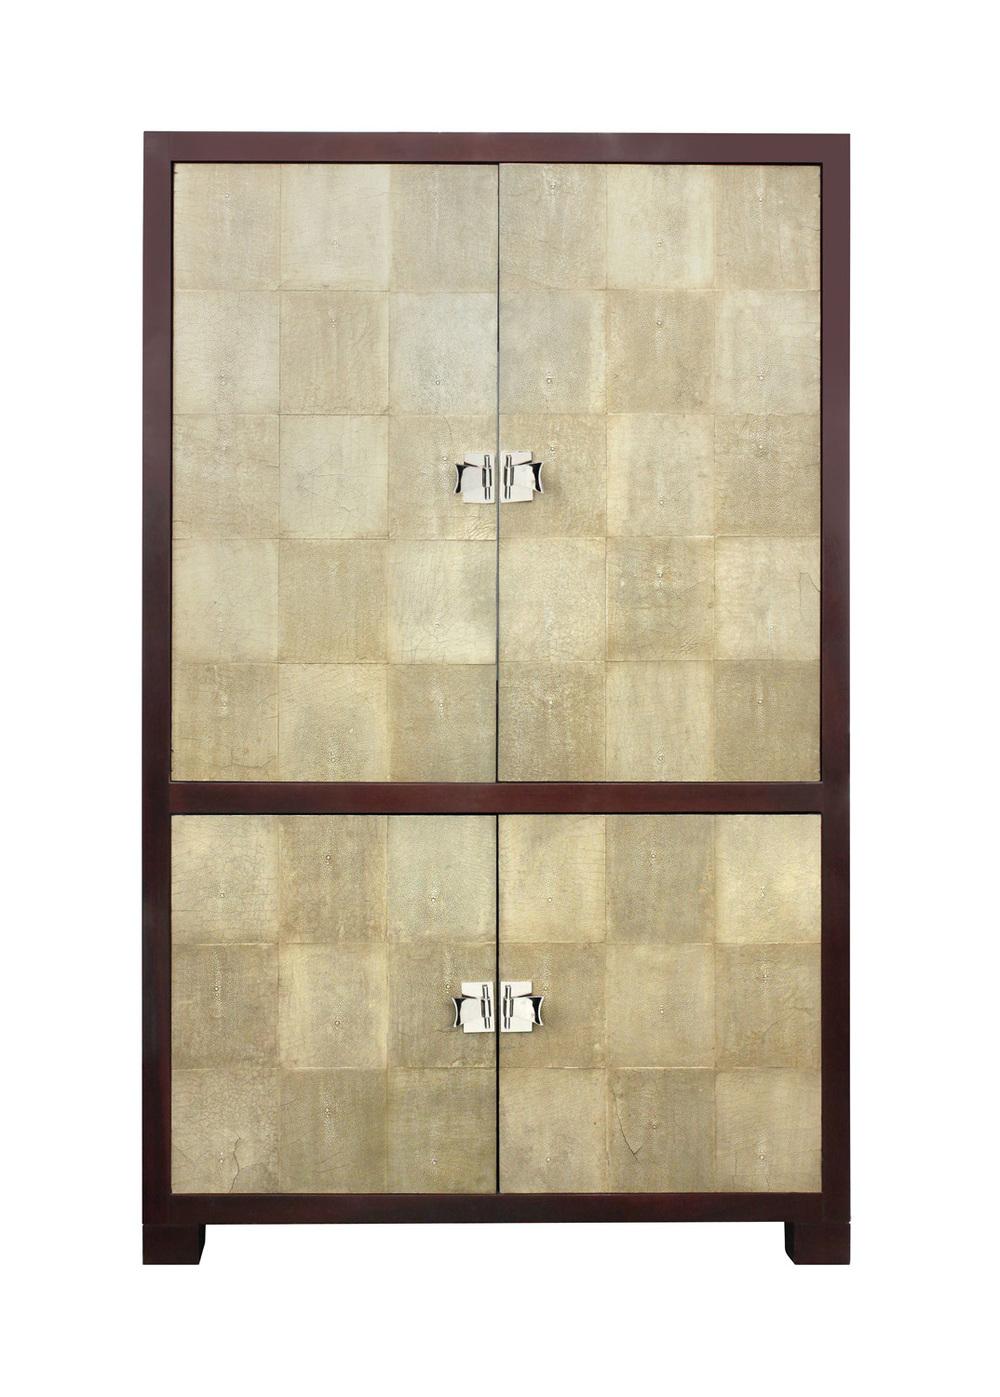 Laslo 150 TV shagreen doors cabinet46 main2 narrow crop hires.jpg